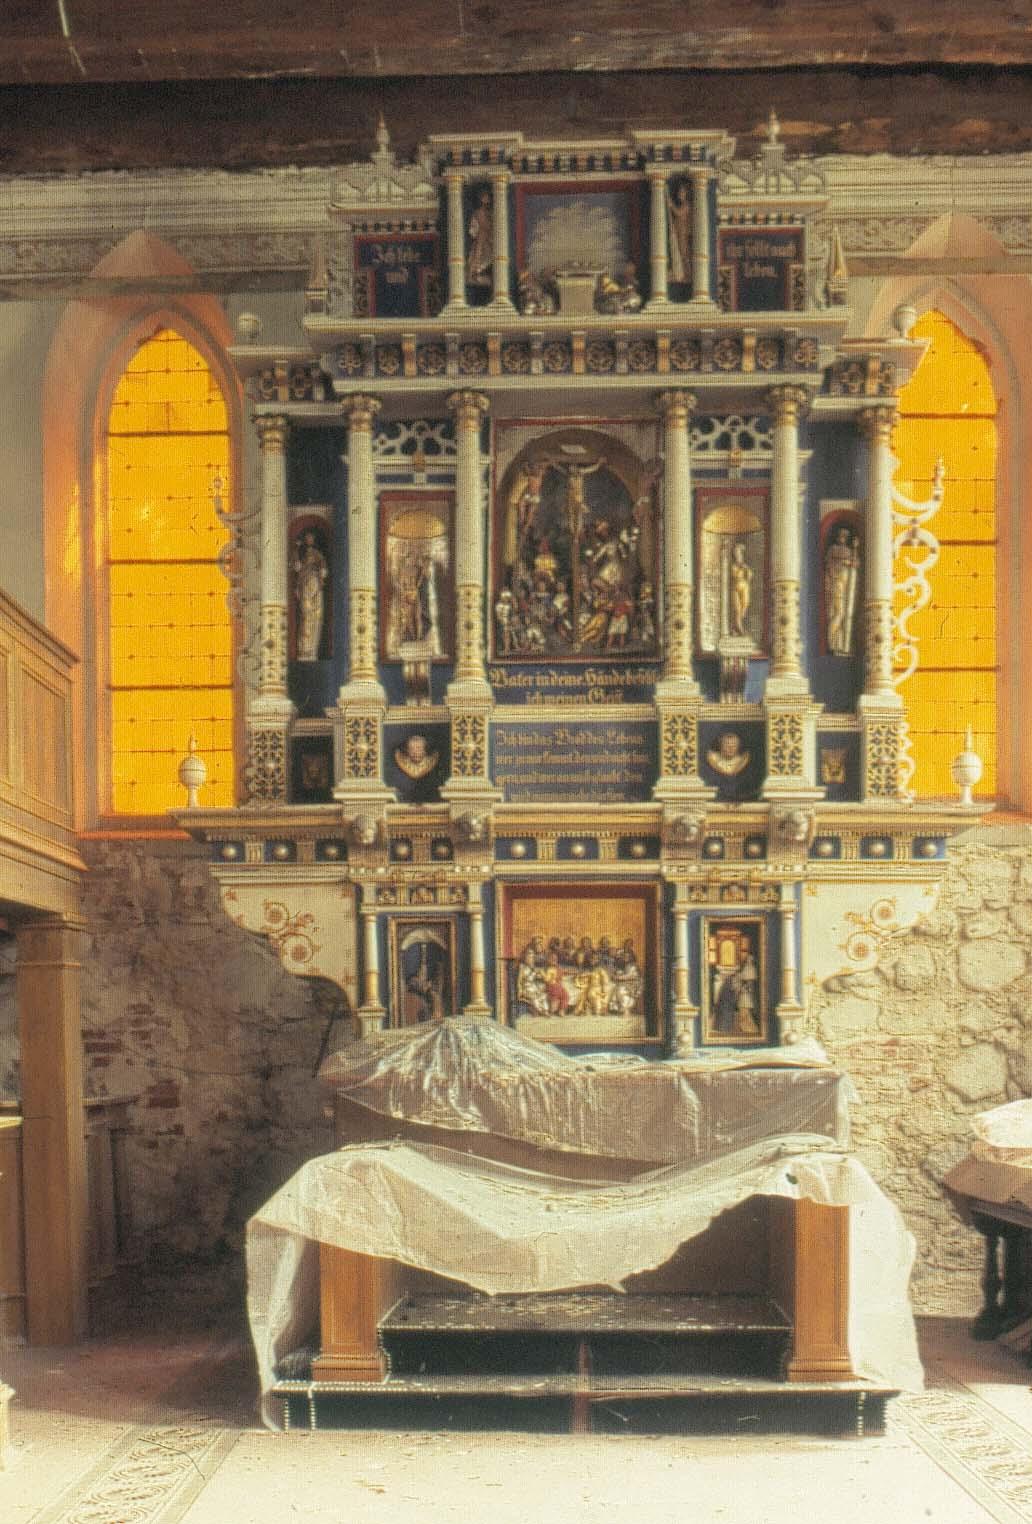 Dorfkirche Blindow - Altaraufsatz